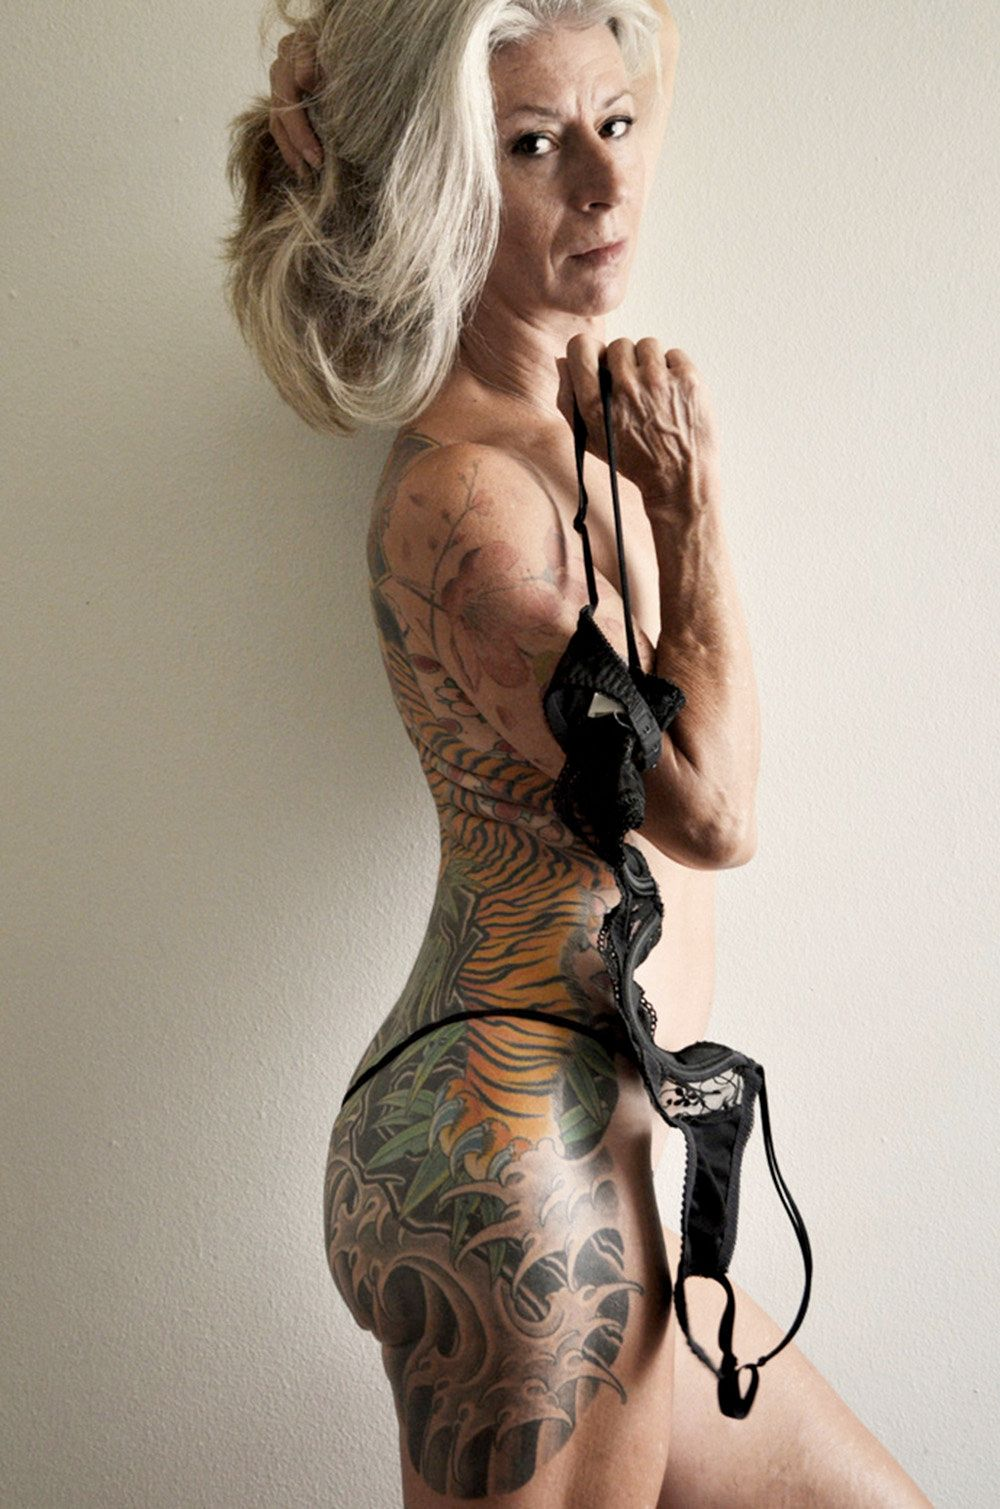 60 year old naked women tumblr